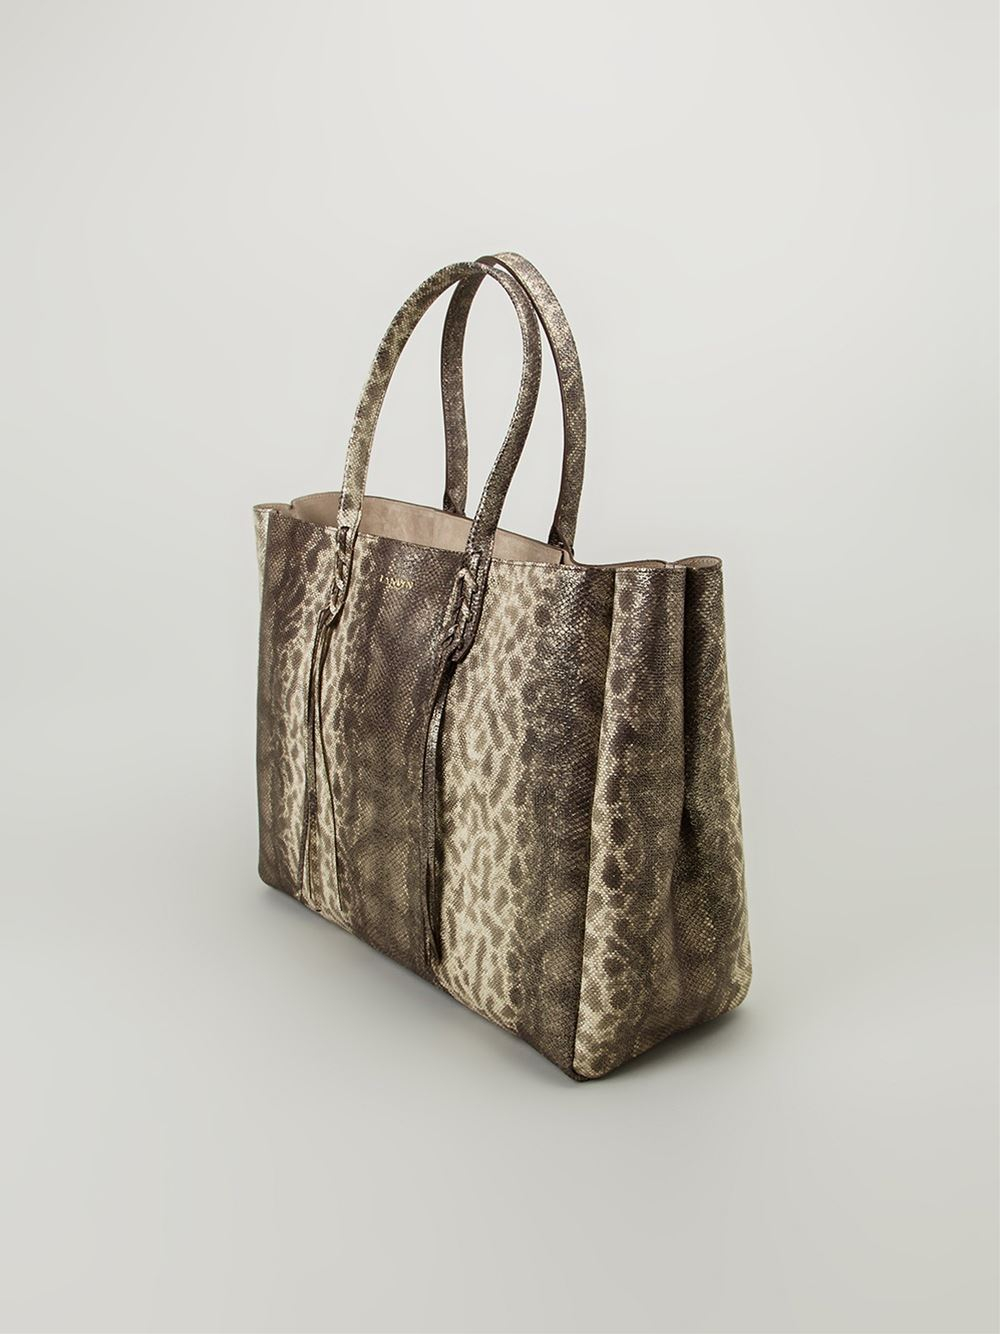 Lanvin Leather and Sheepskin Shopper Tote in Metallic (Brown)